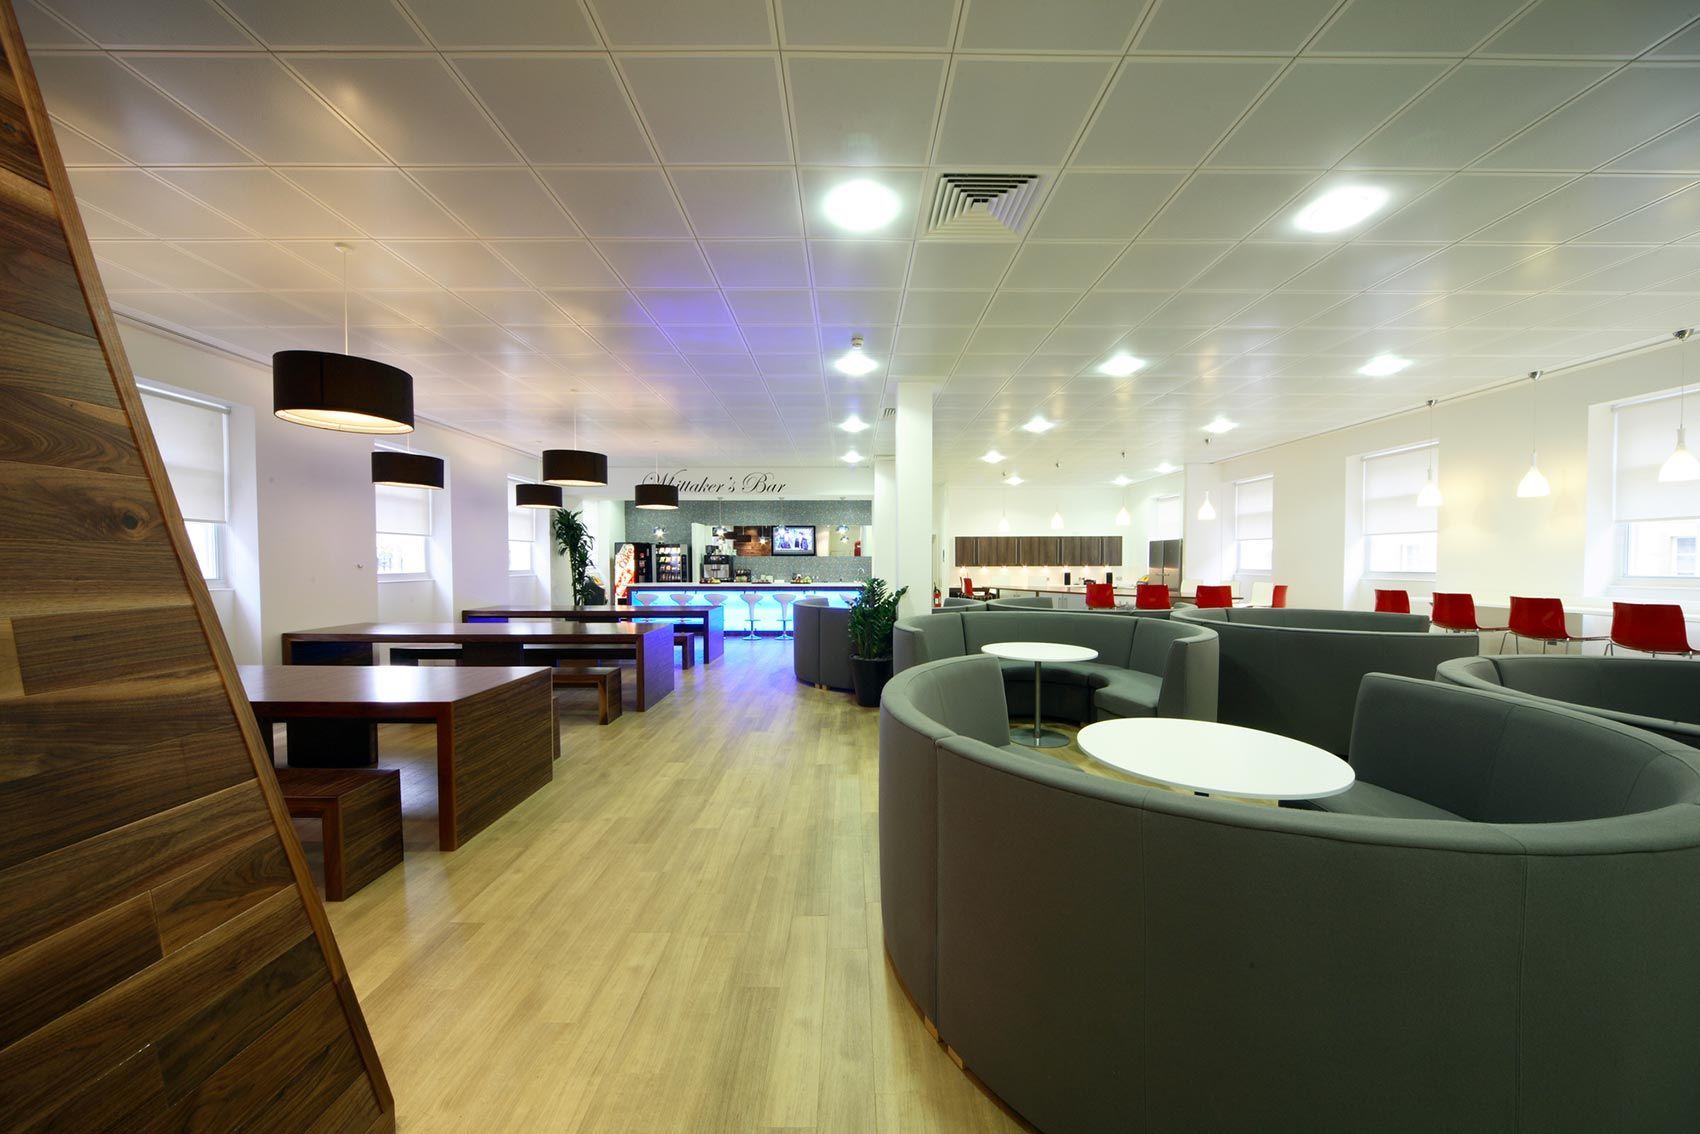 Inspirational Office Design Office Design Office Inspiration Design